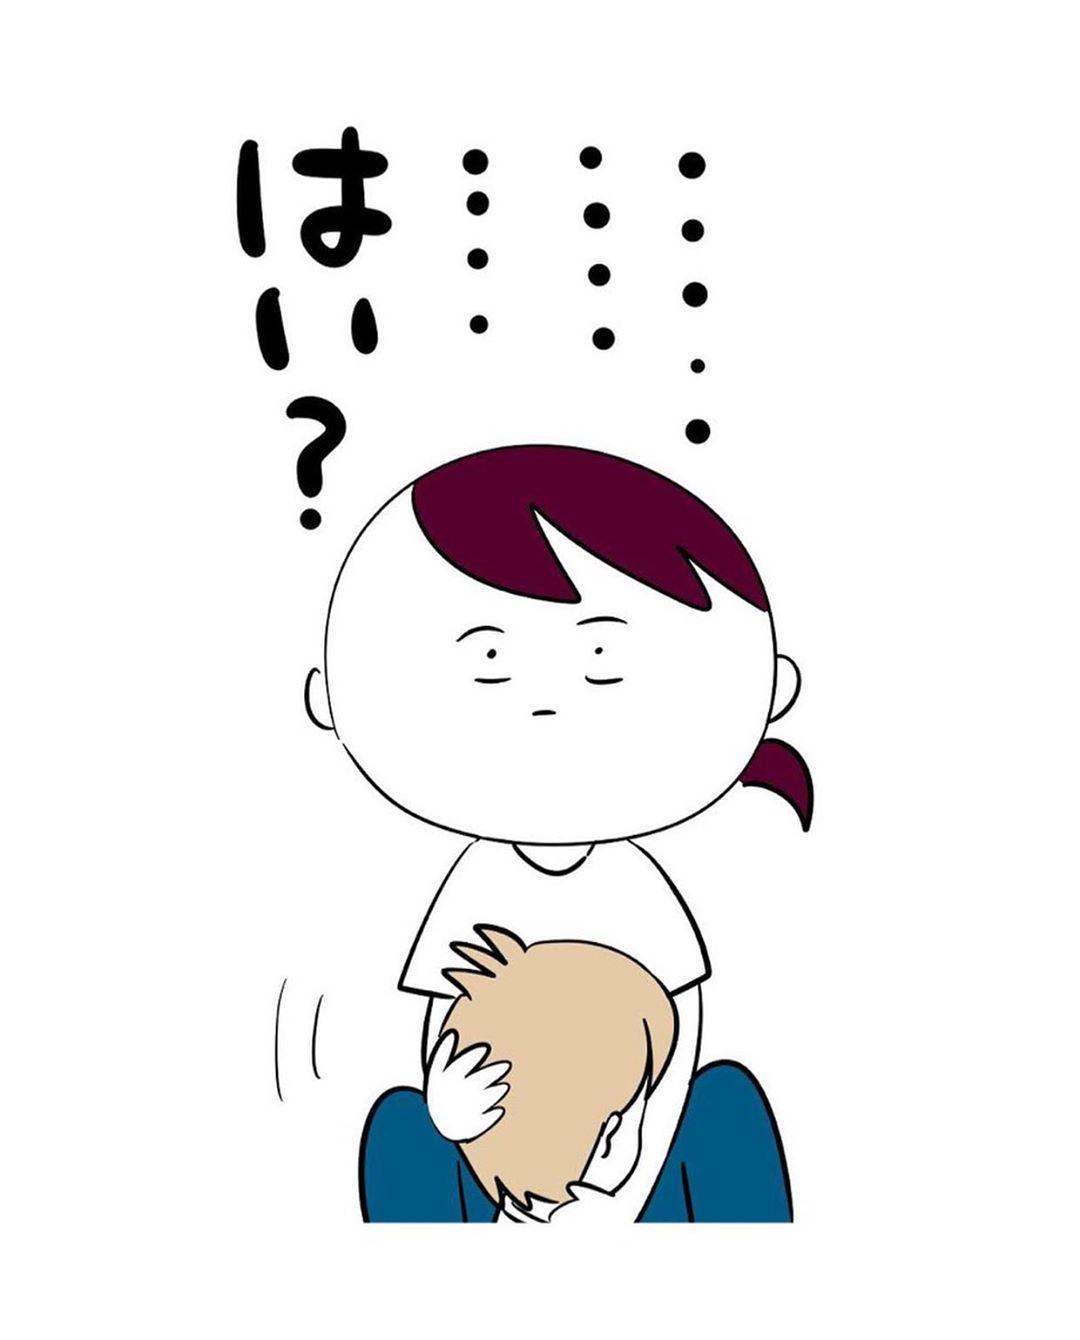 shirota.yunya_71718903_164046534662658_96489667079905242_n